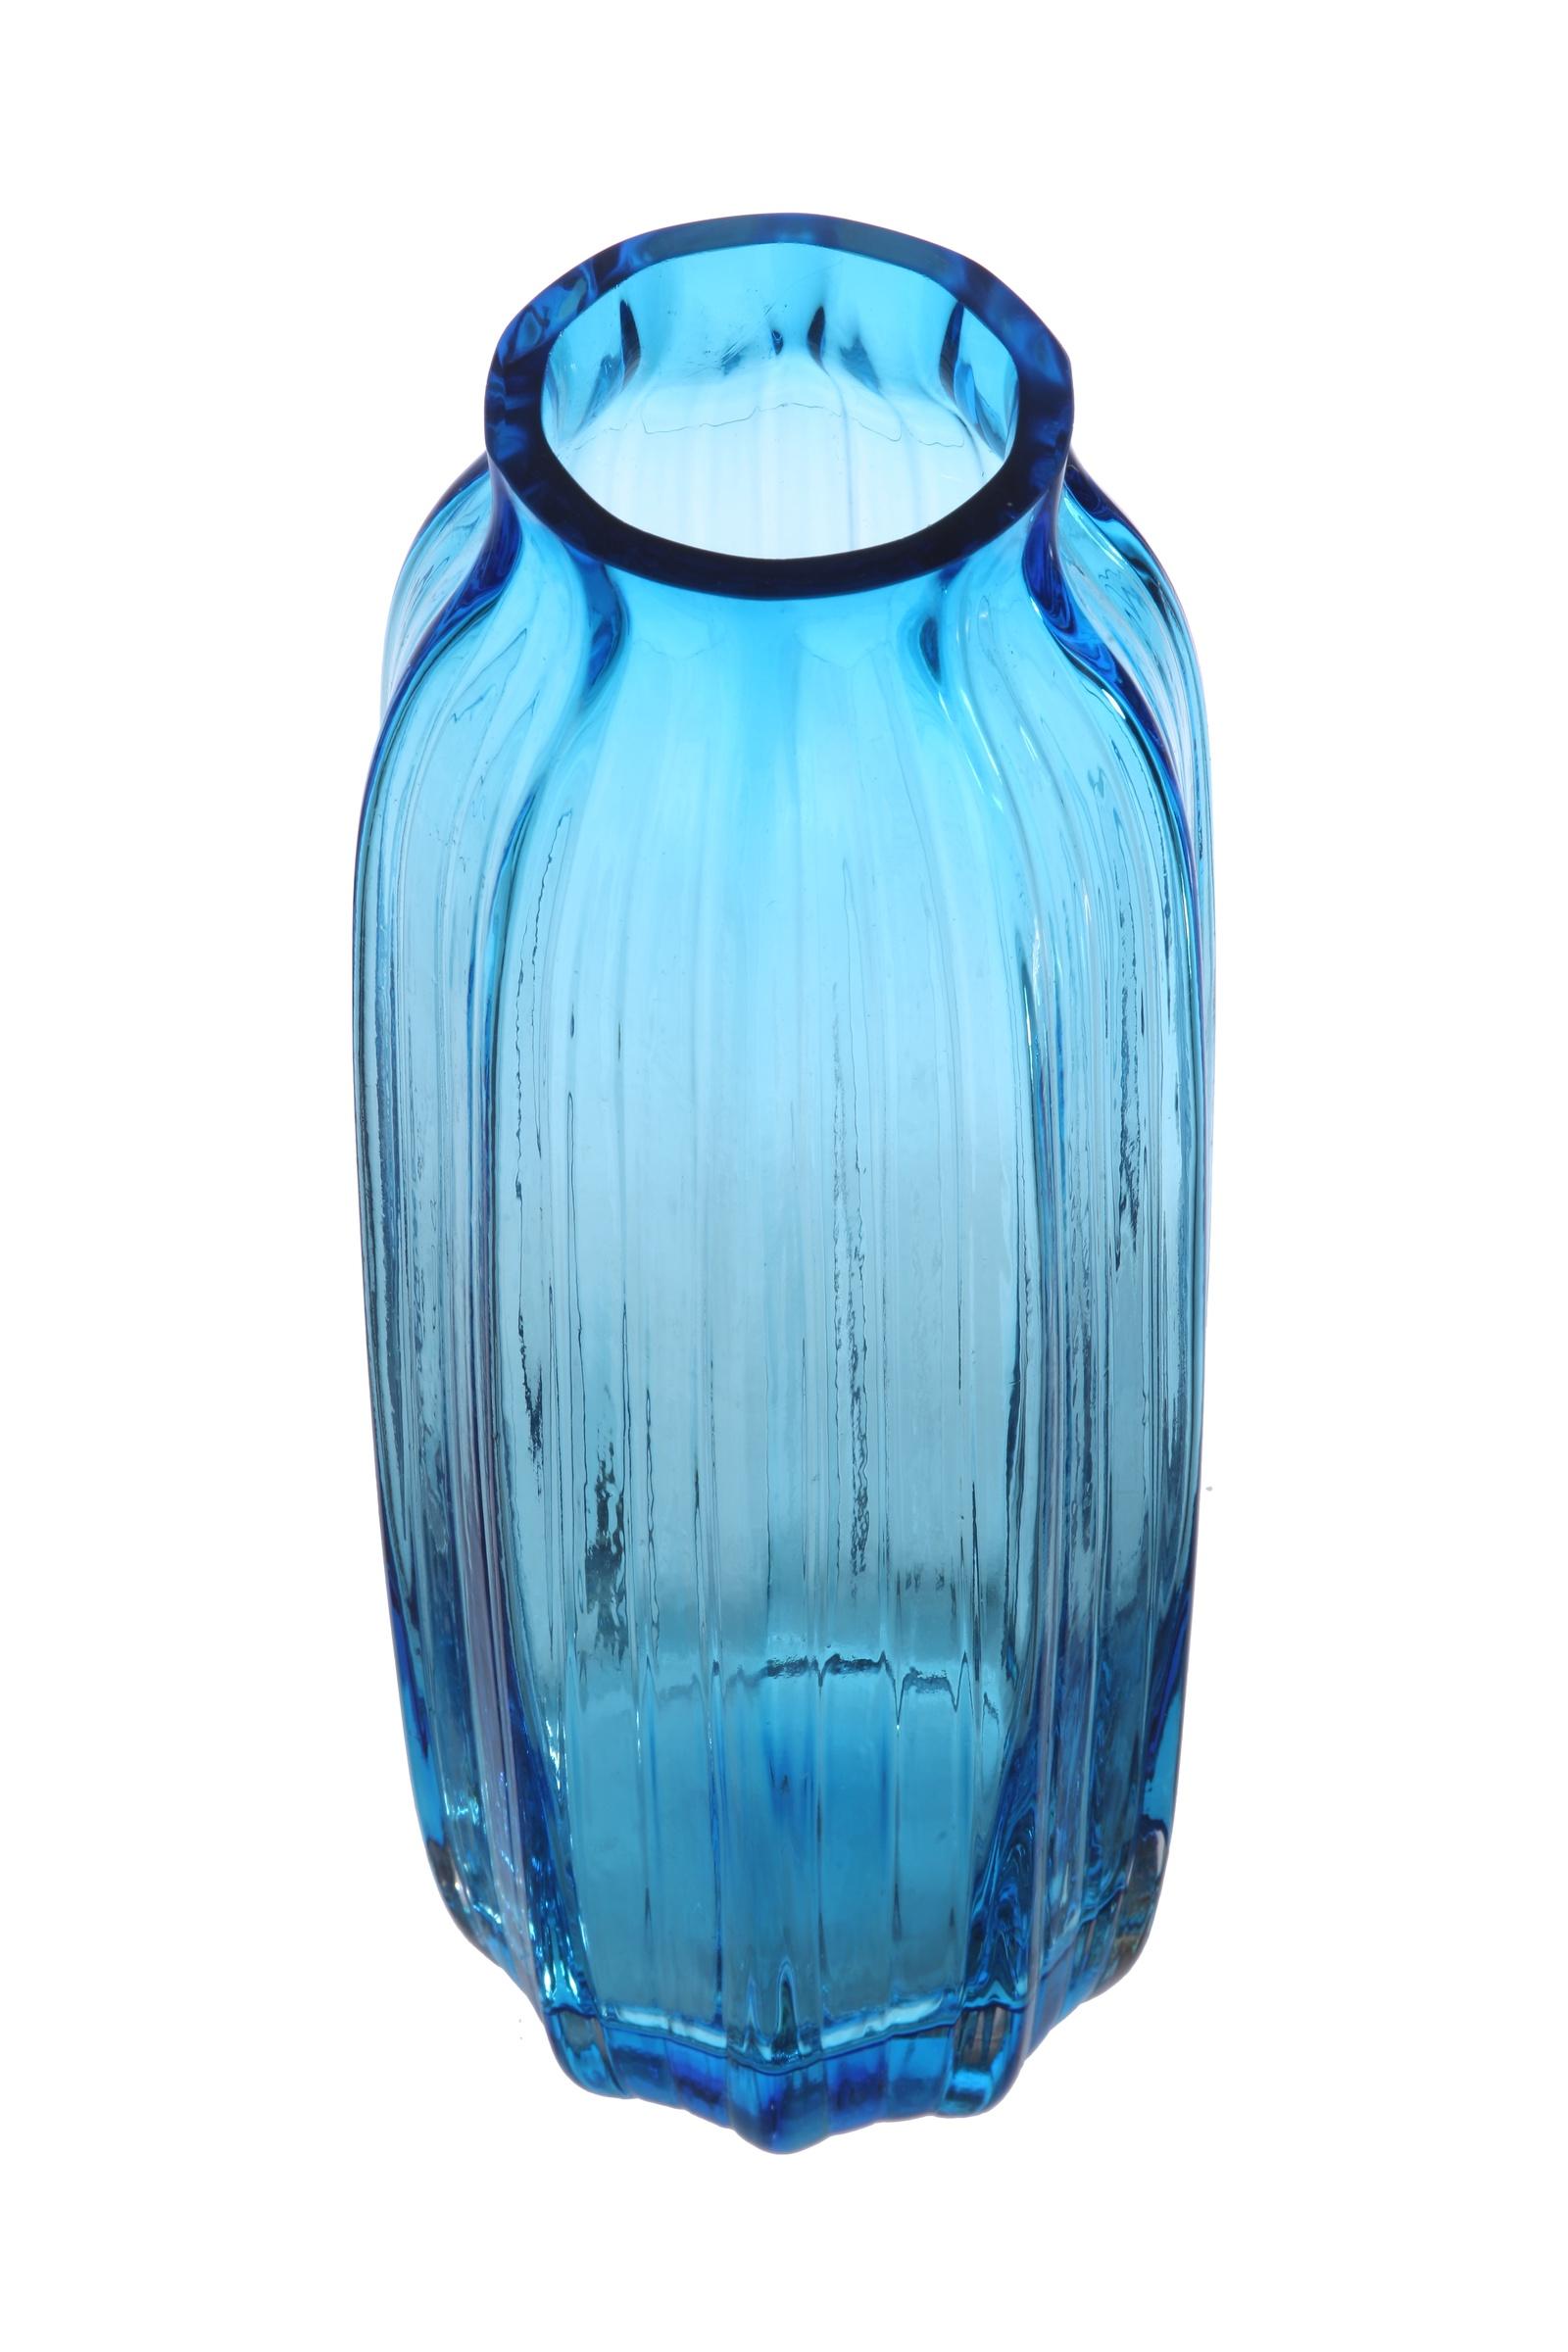 Ваза IsmatDecor Стеклянная ваза, ST-6 голубой, голубой